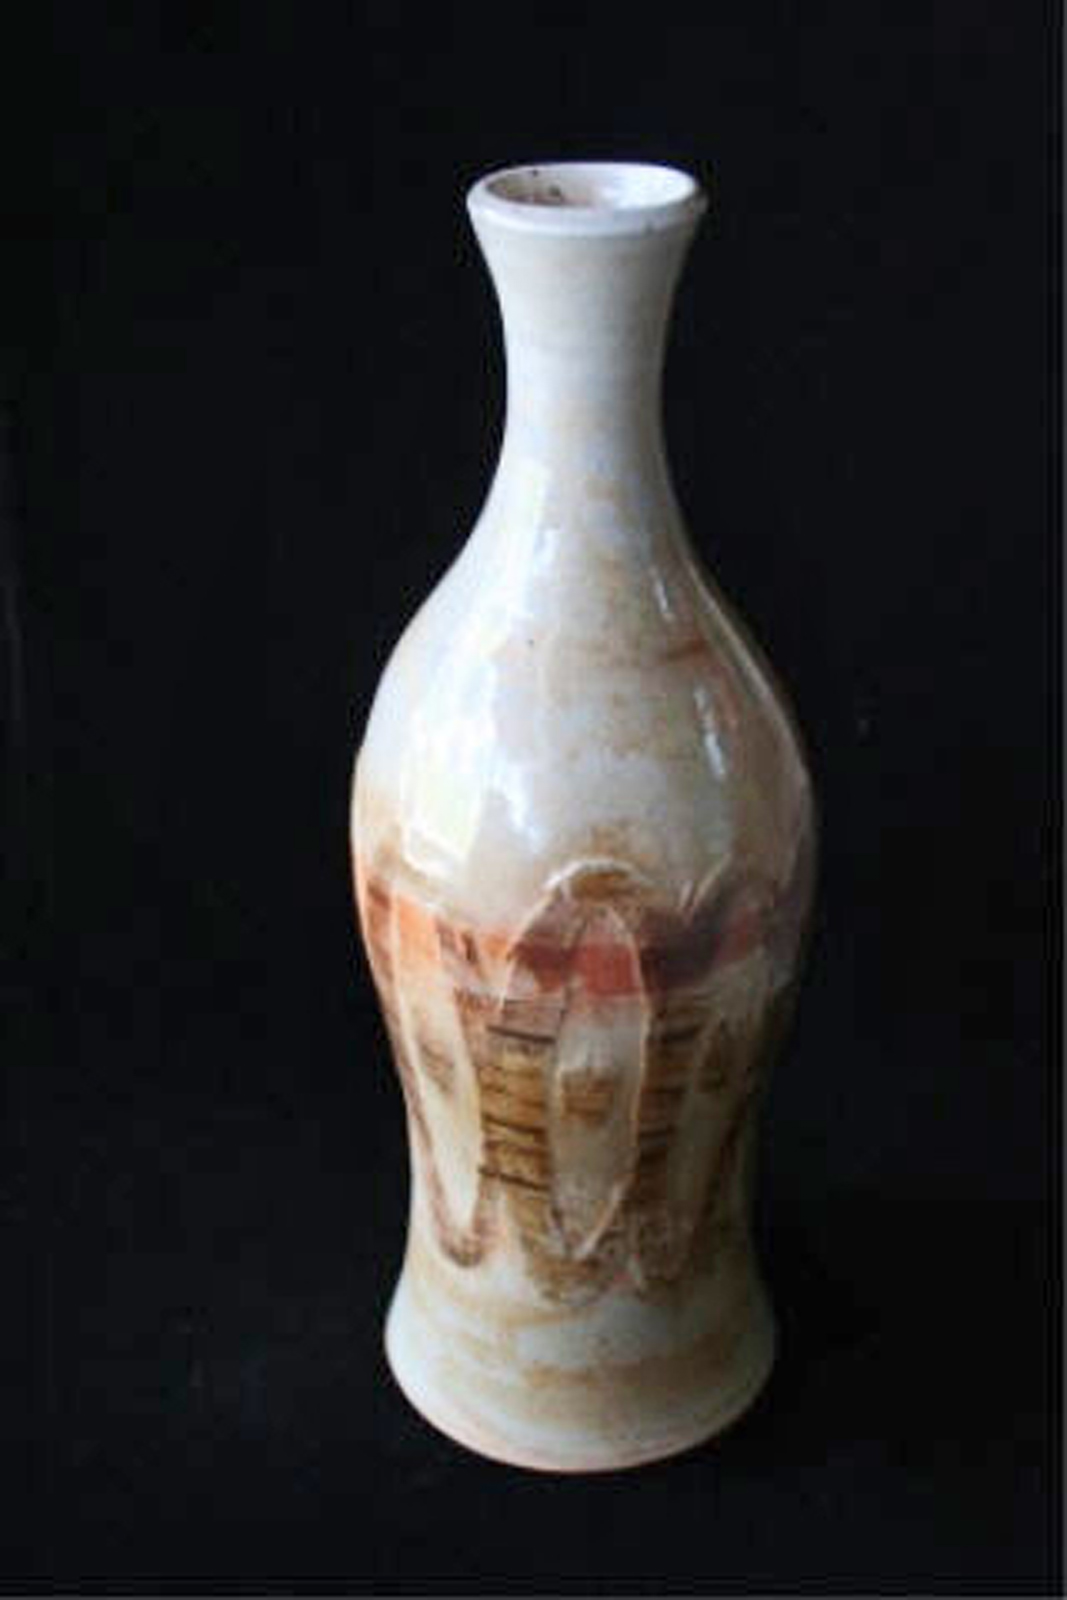 "Air in Rhythm  , 2003, wheel-thrown white stoneware Fired at cone 10 reduction, 13"" h x 4 1/2"" dia"